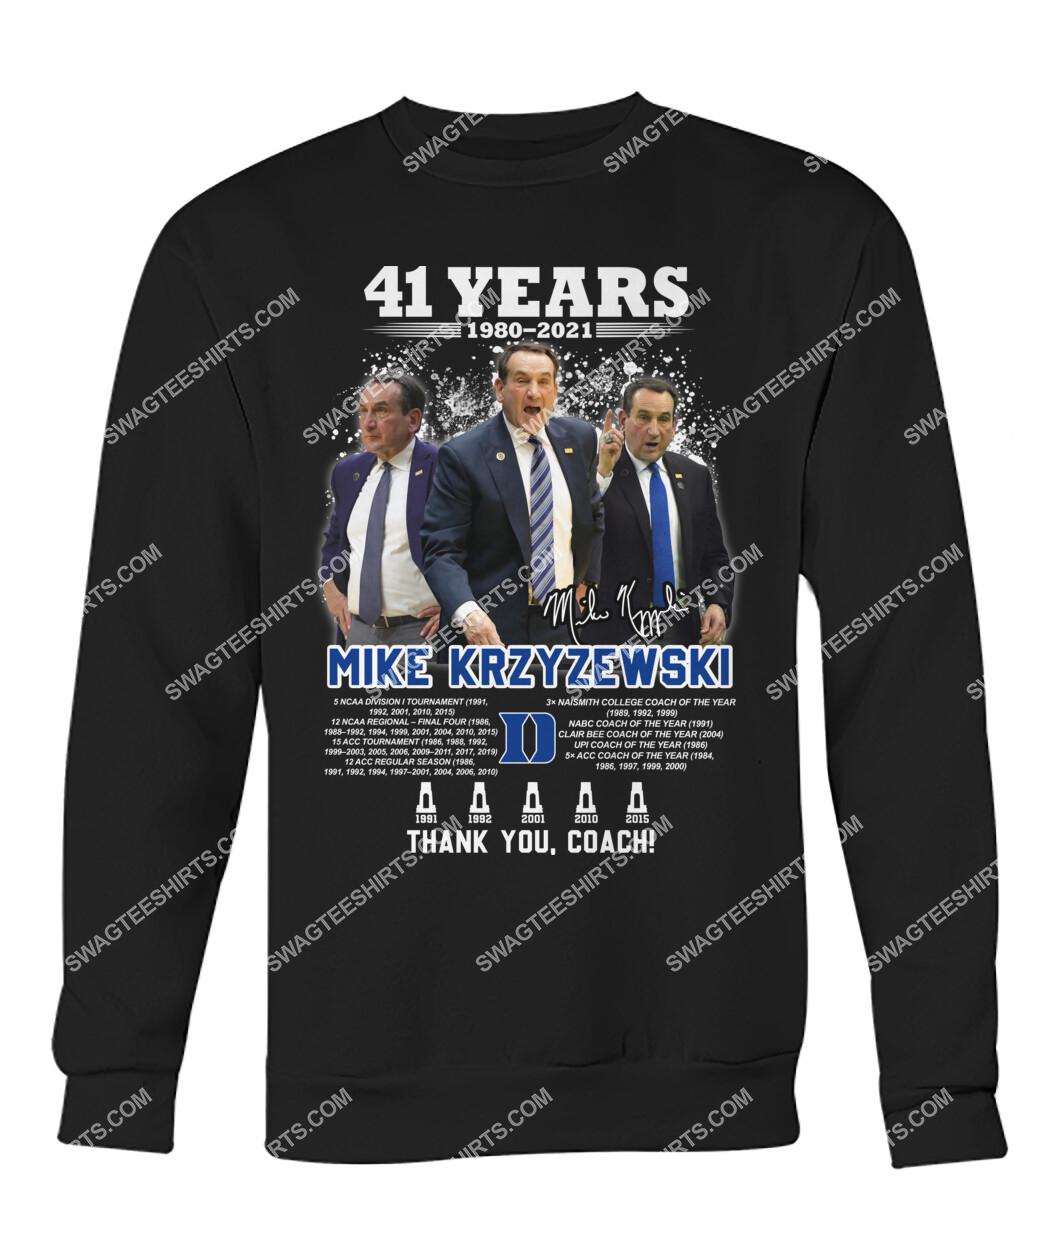 41 years 190 2021 mike krzyzewski thank you coach signatures sweatshirt 1